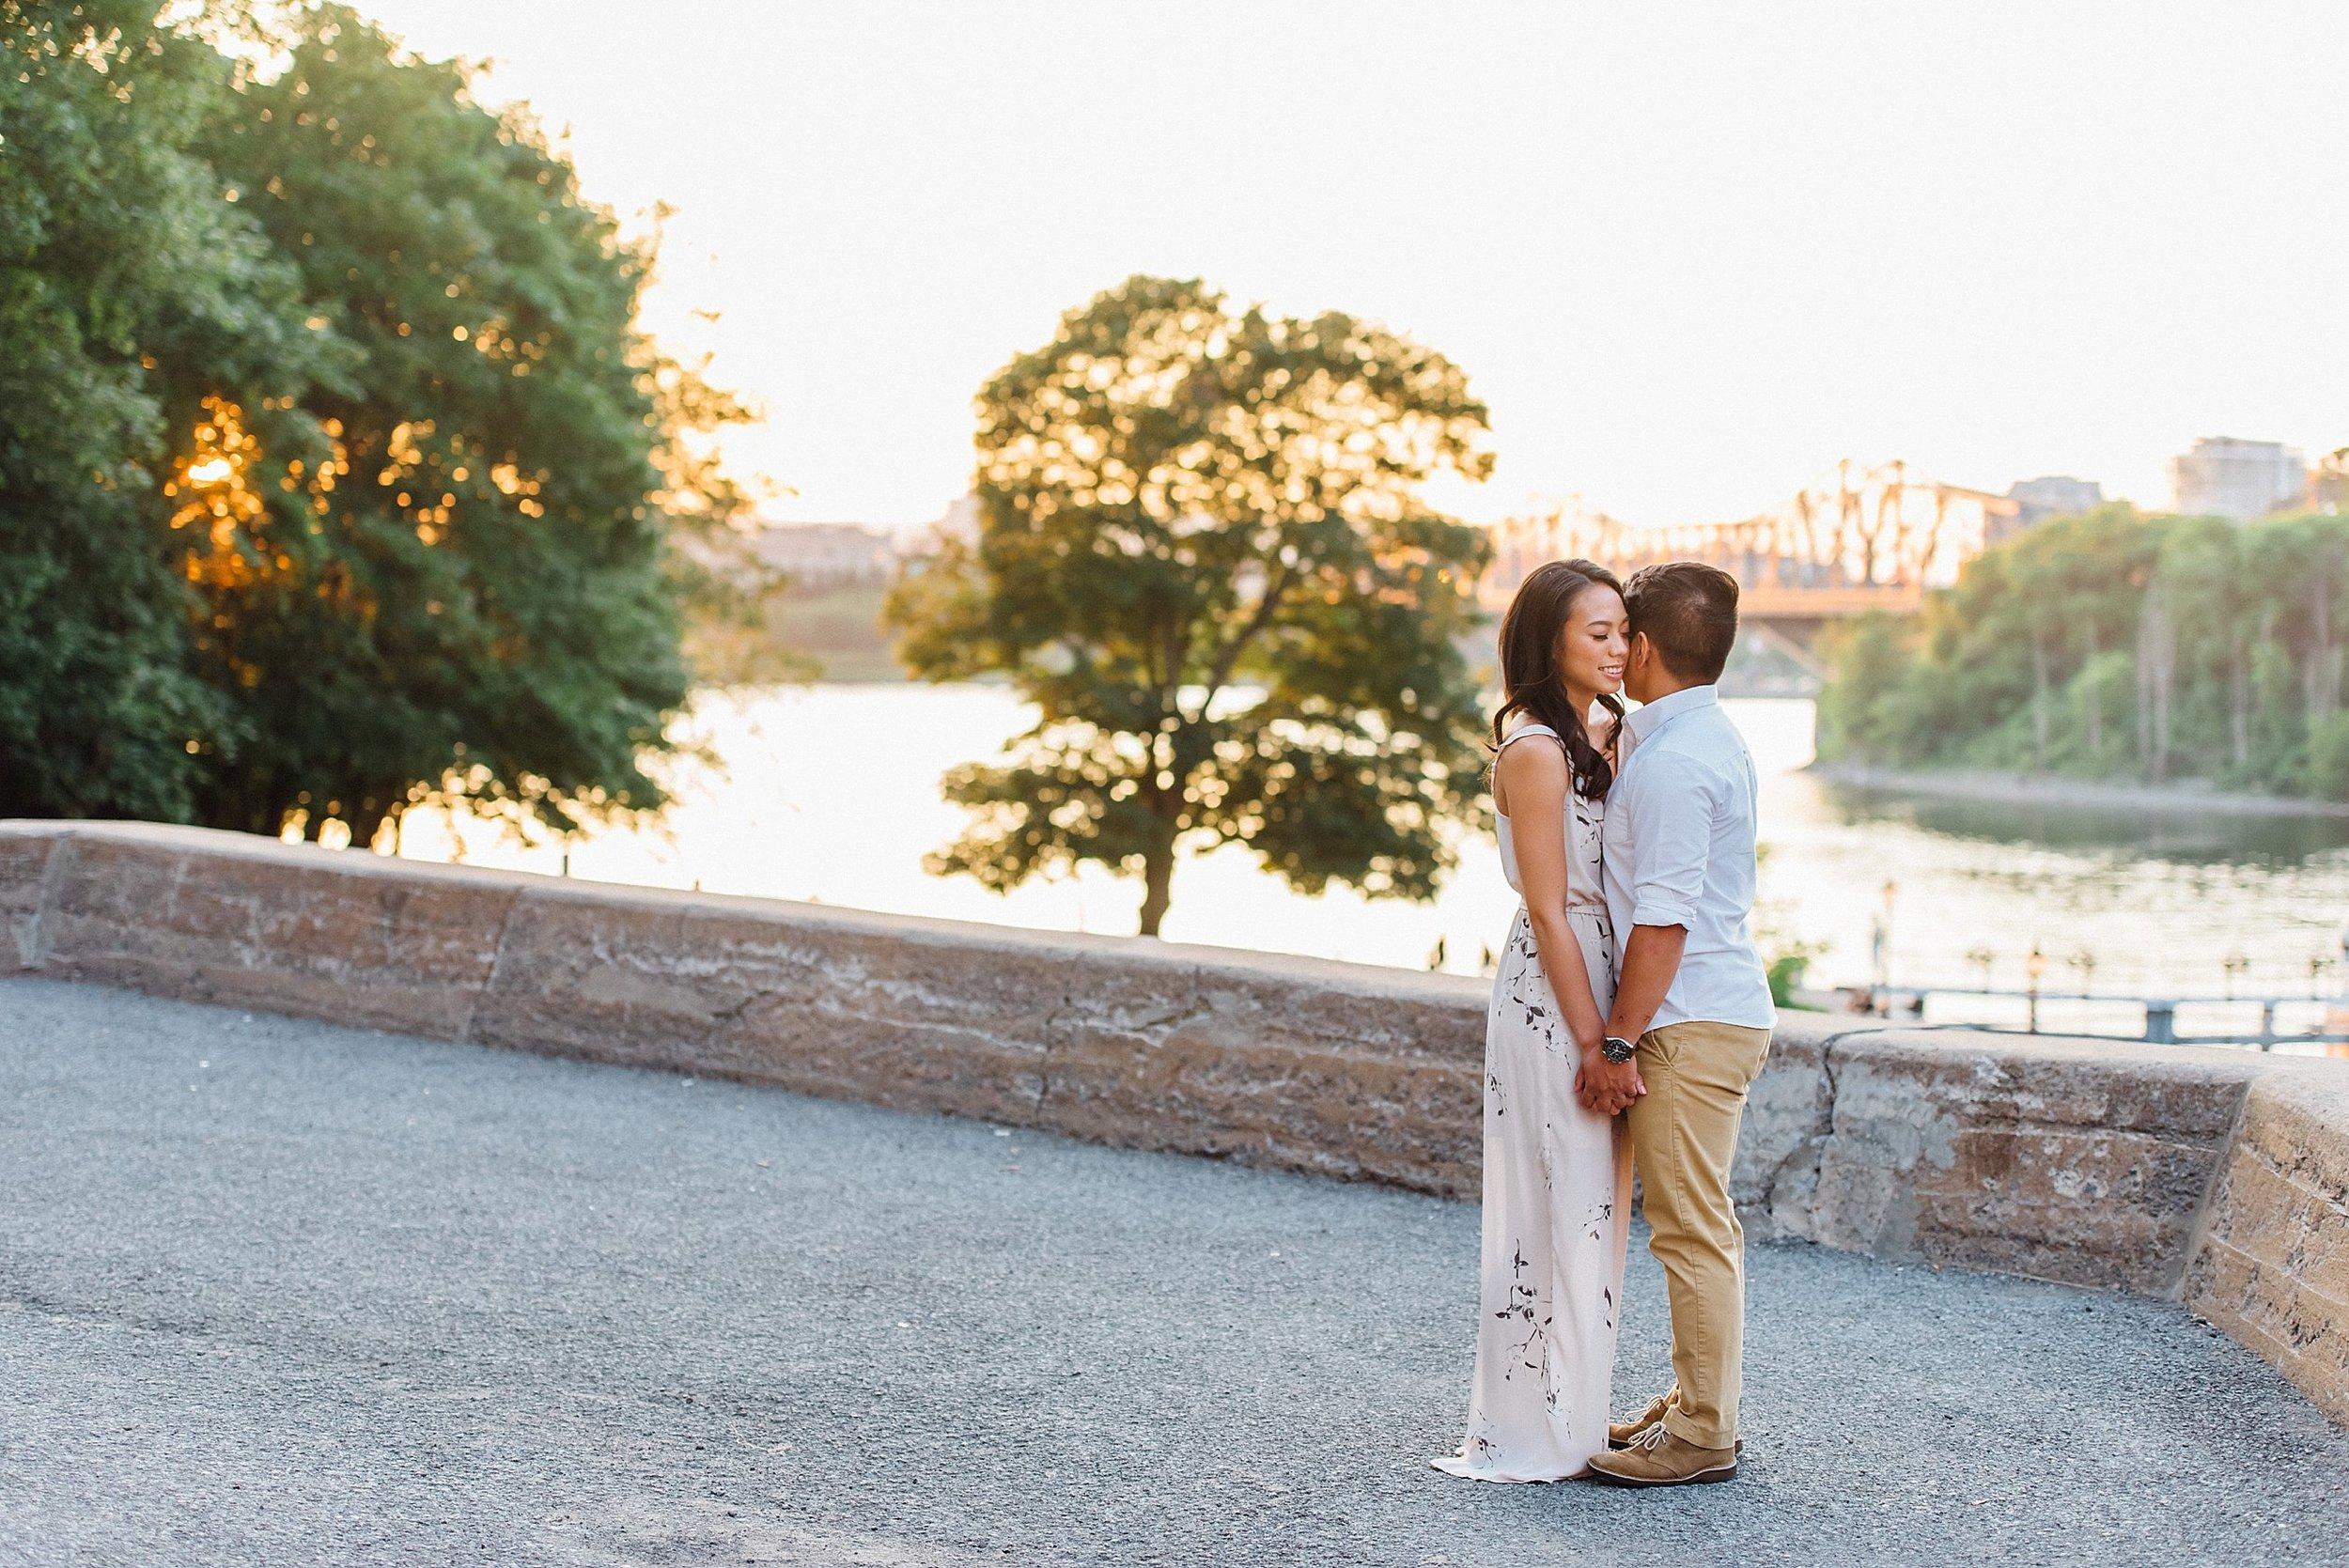 Ali and Batoul Photography - light, airy, indie documentary Ottawa wedding photographer_0296.jpg